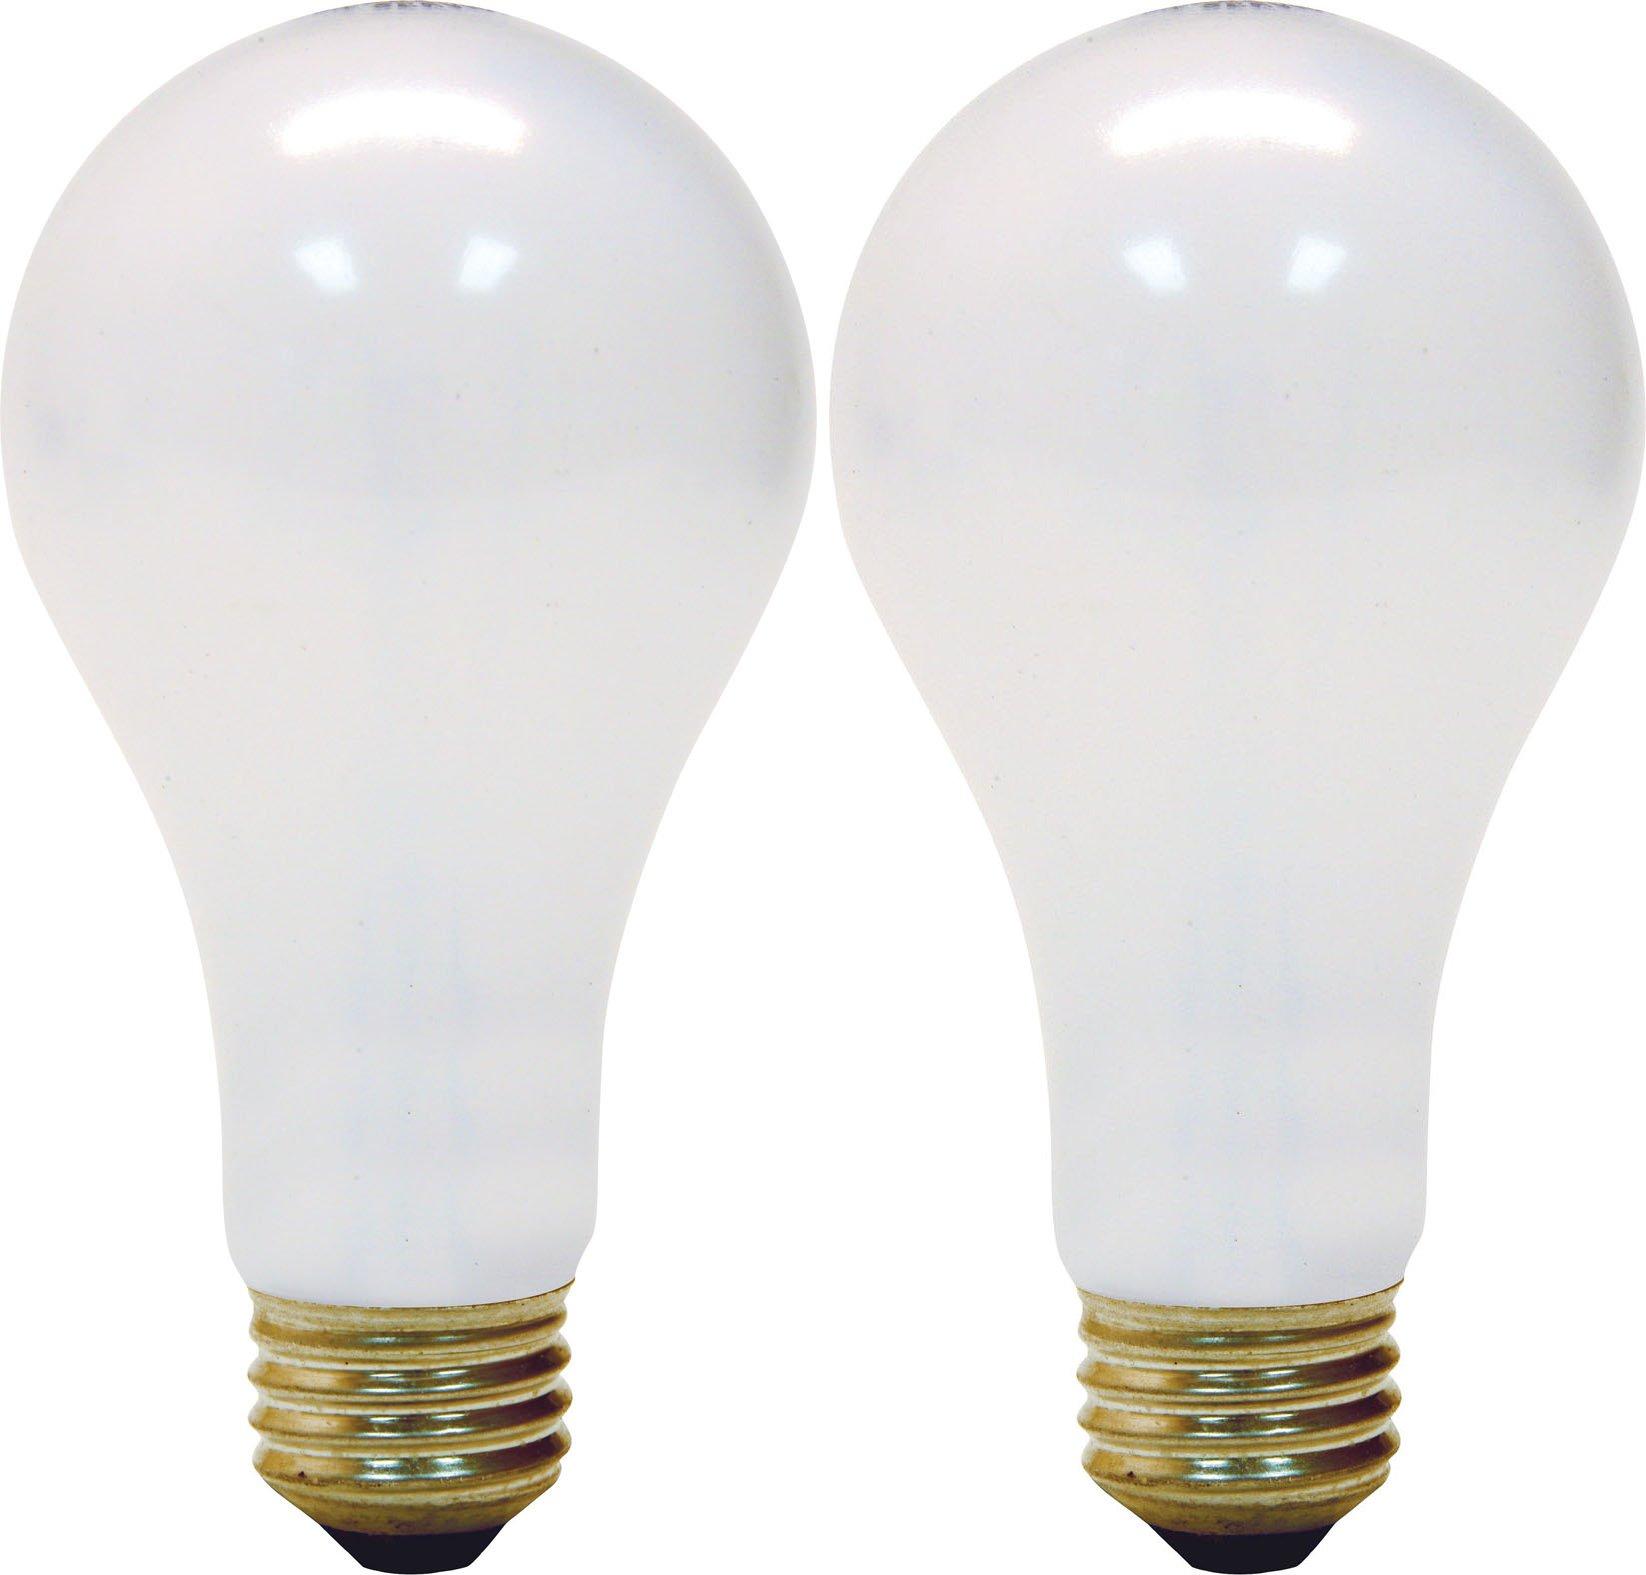 GE Lighting 97763 50/100/150-Watt 615/1540/2155-Lumen A21 3-Way Light Bulb, Soft White, 2-Pack